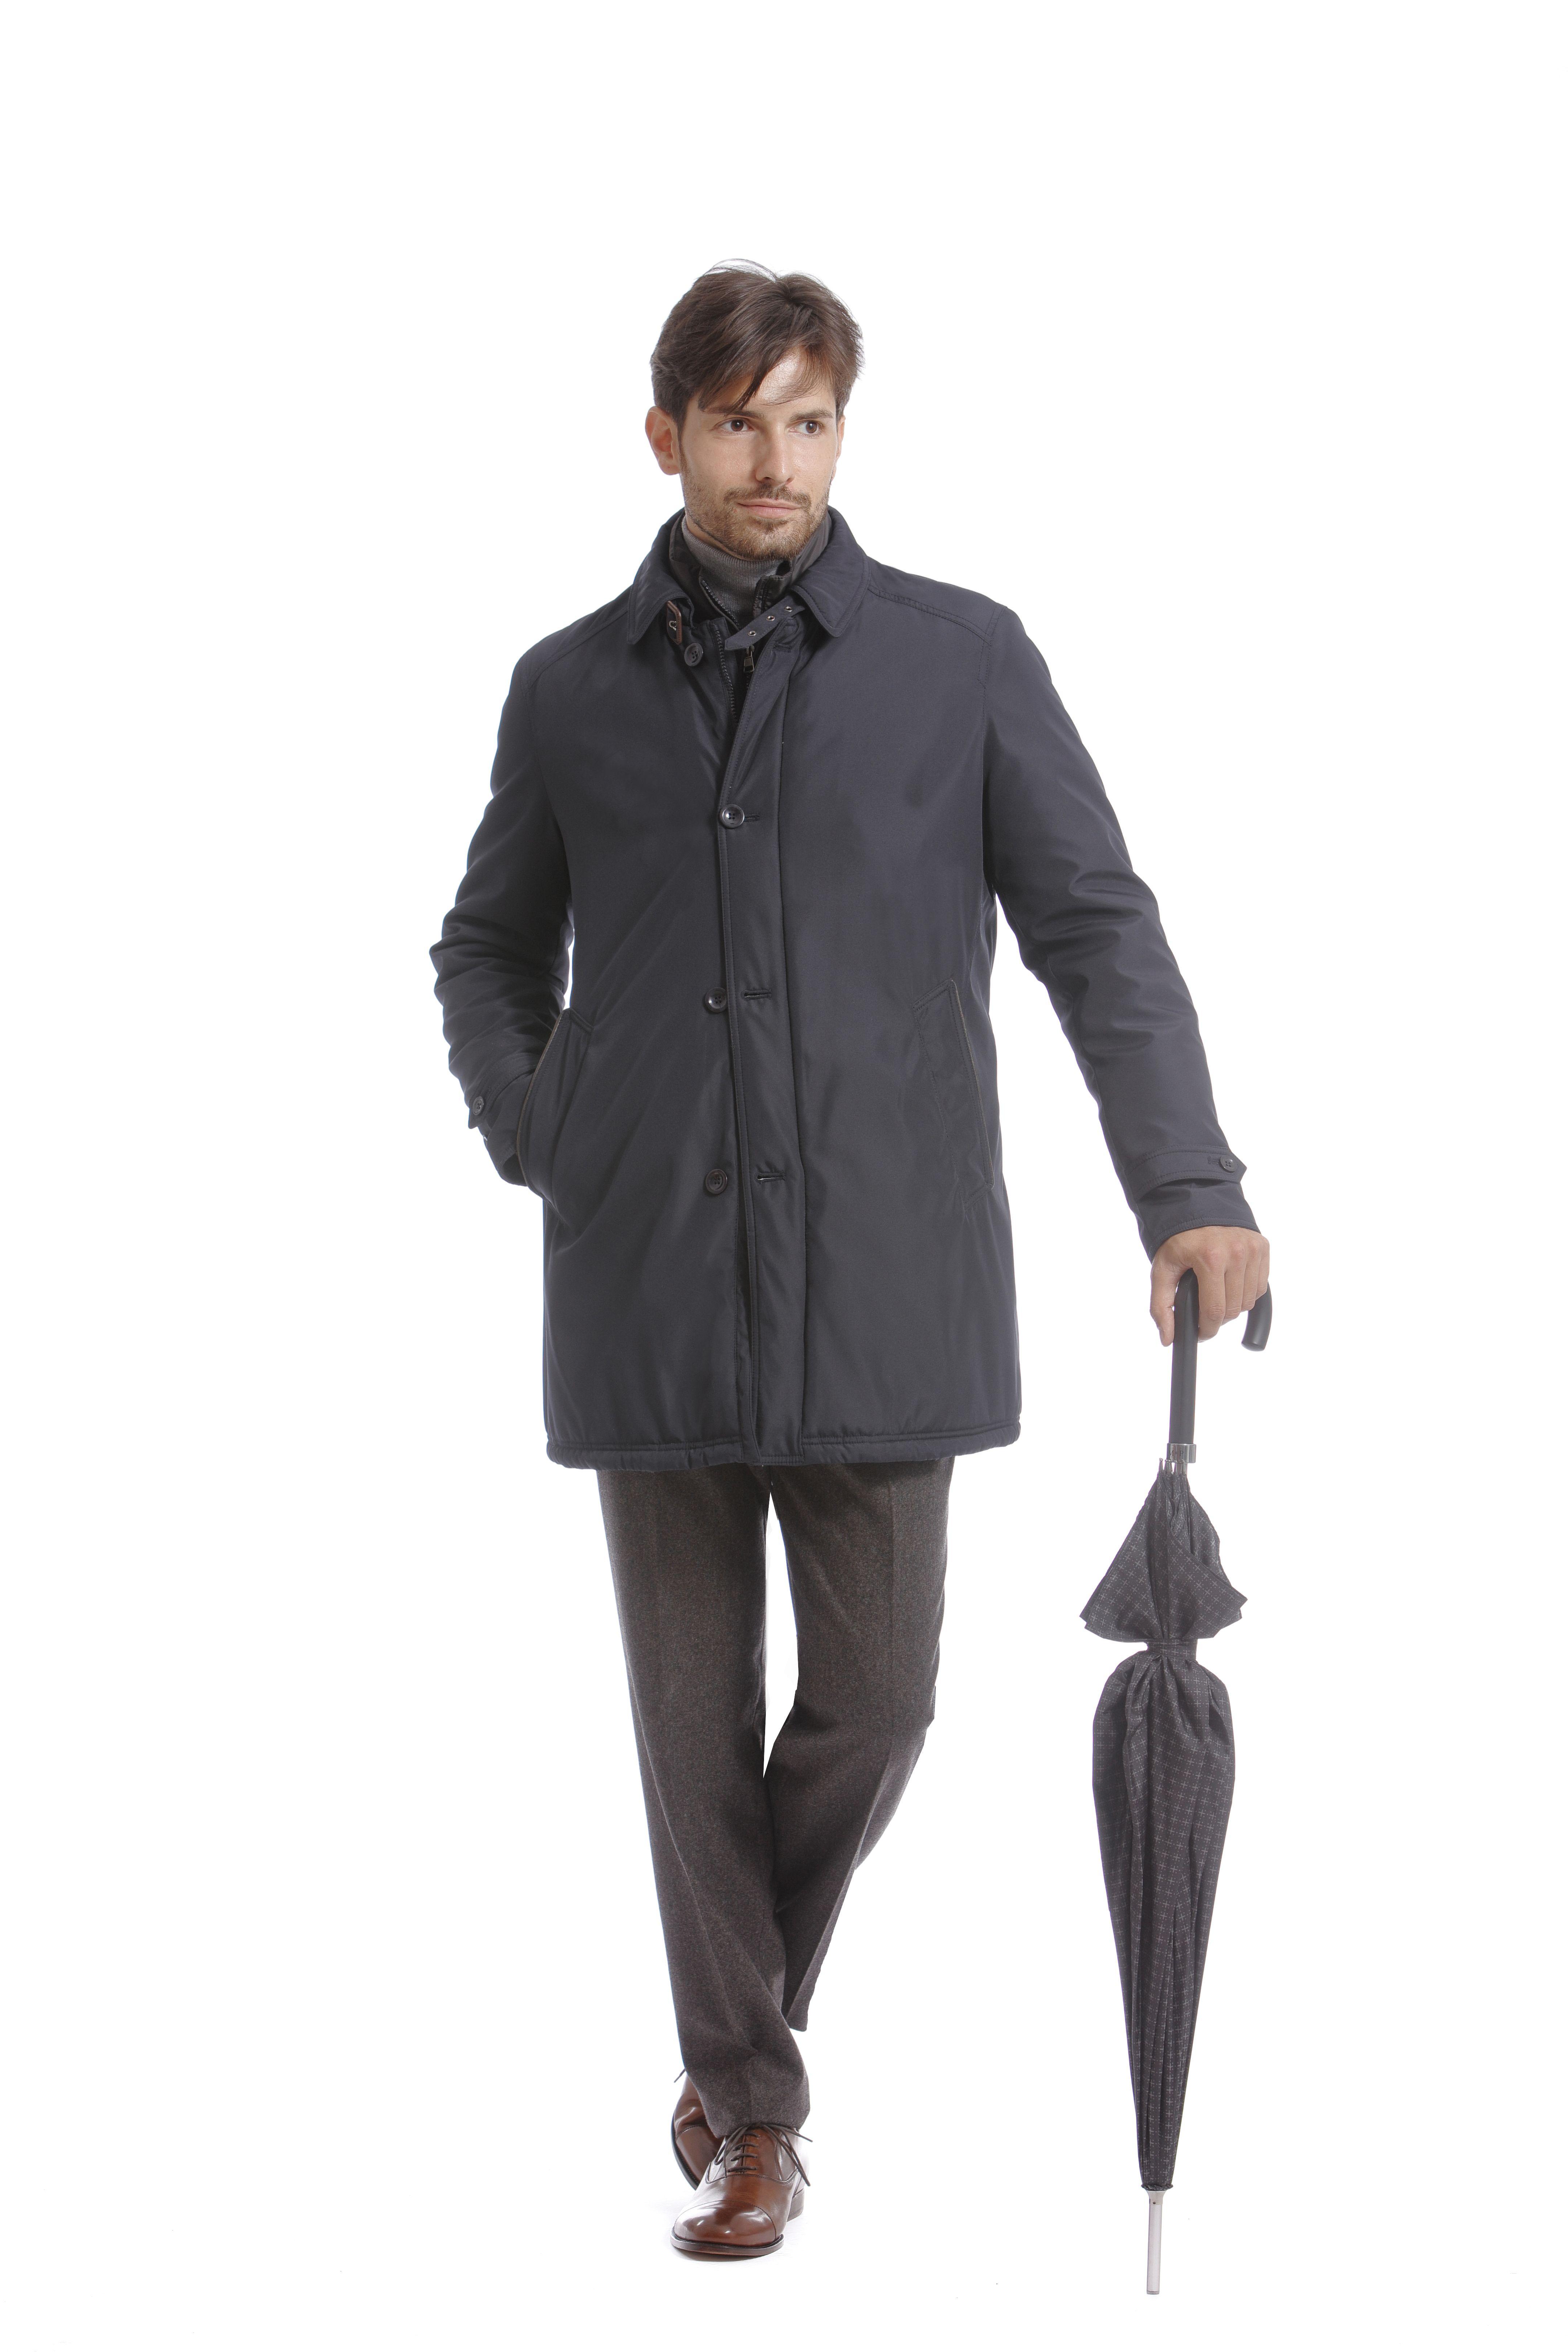 Tortora tessuto tecnico dove grey technical fabric - Tortora Tessuto Tecnico Dove Grey Technical Fabric 34